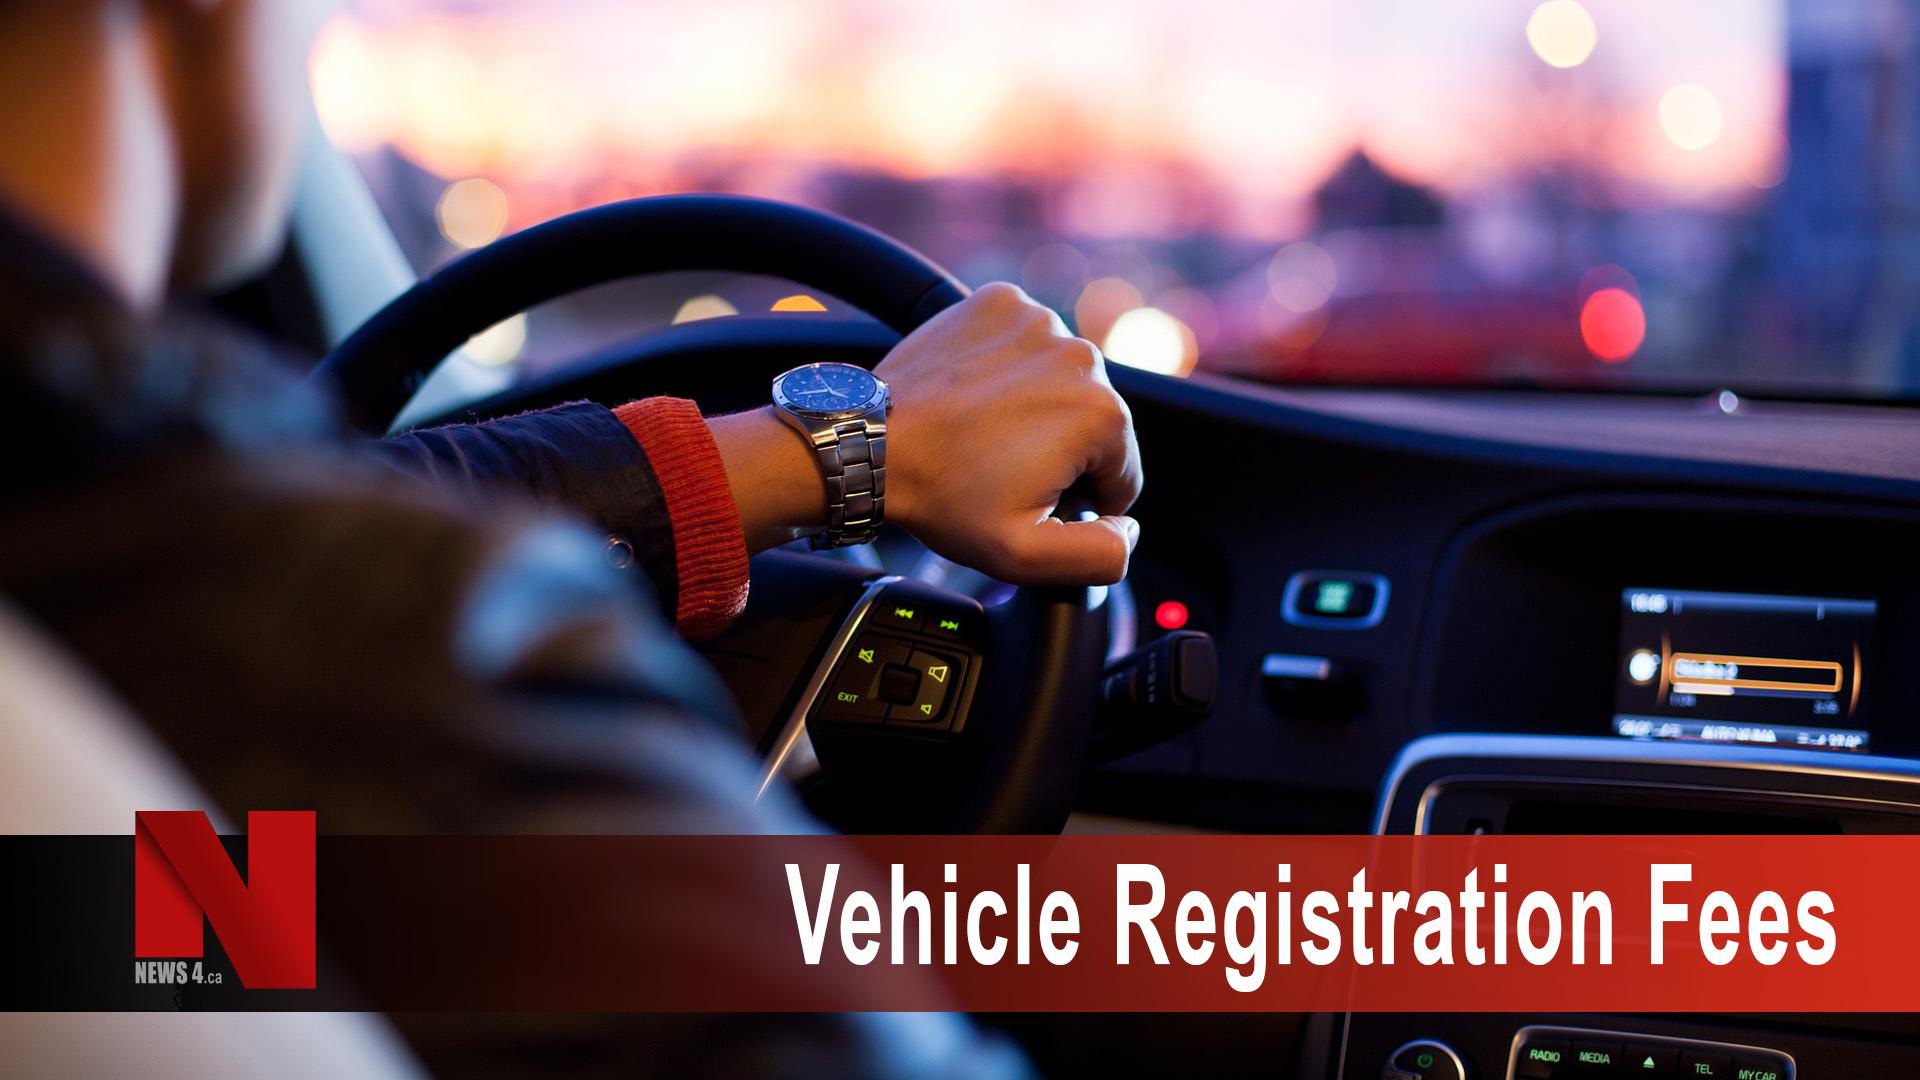 Vehicle Registration Fees